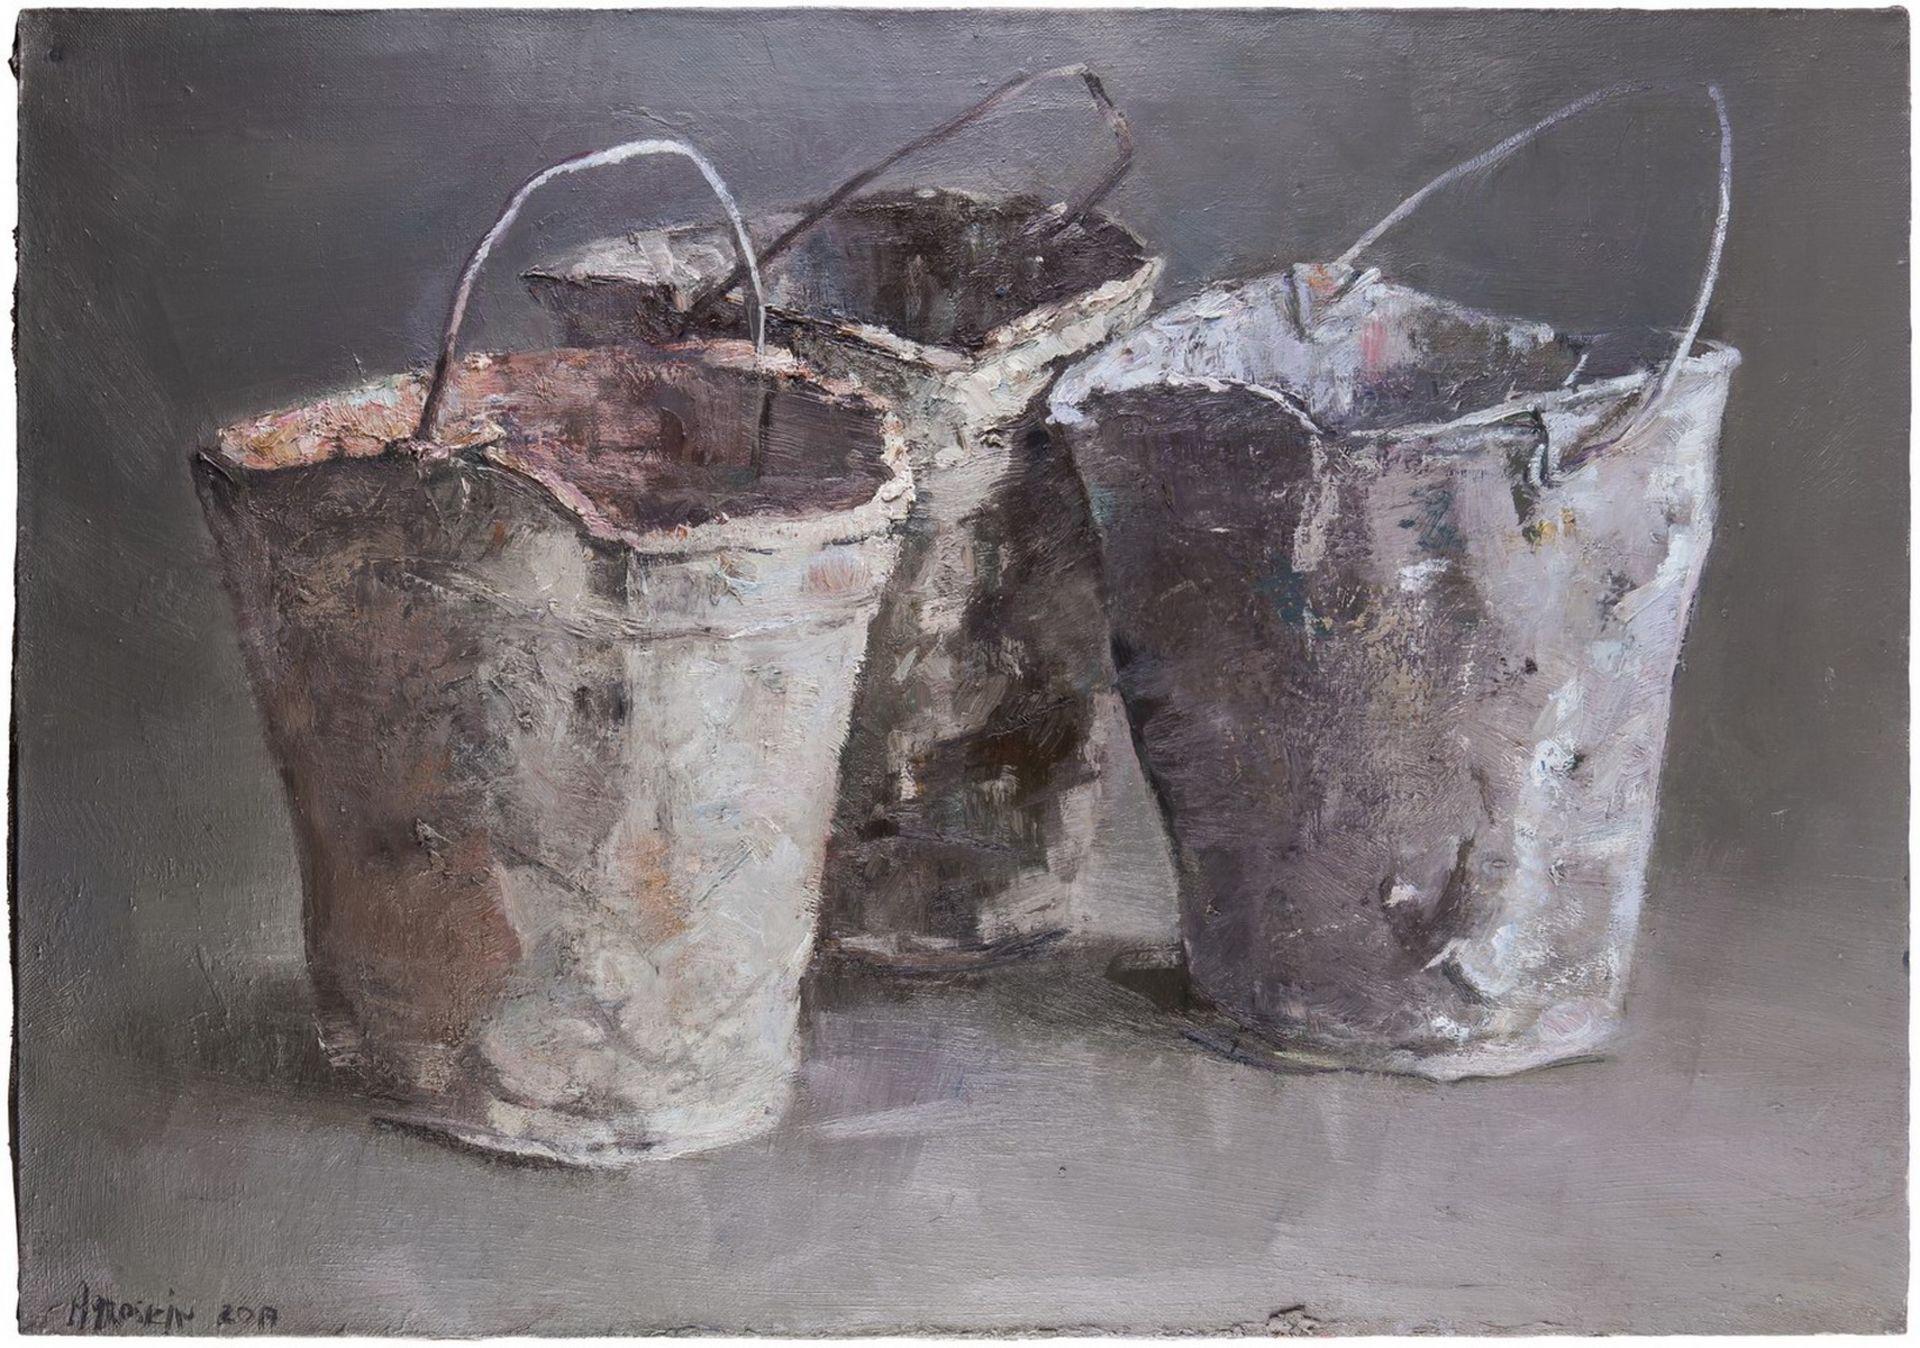 Agroskin, S.E. Buckets. 2017. Oil on canvas. 70x100 cm.<br>Signed. <br>Sales: Lyon &amp; Turnbull (A - Bild 2 aus 3